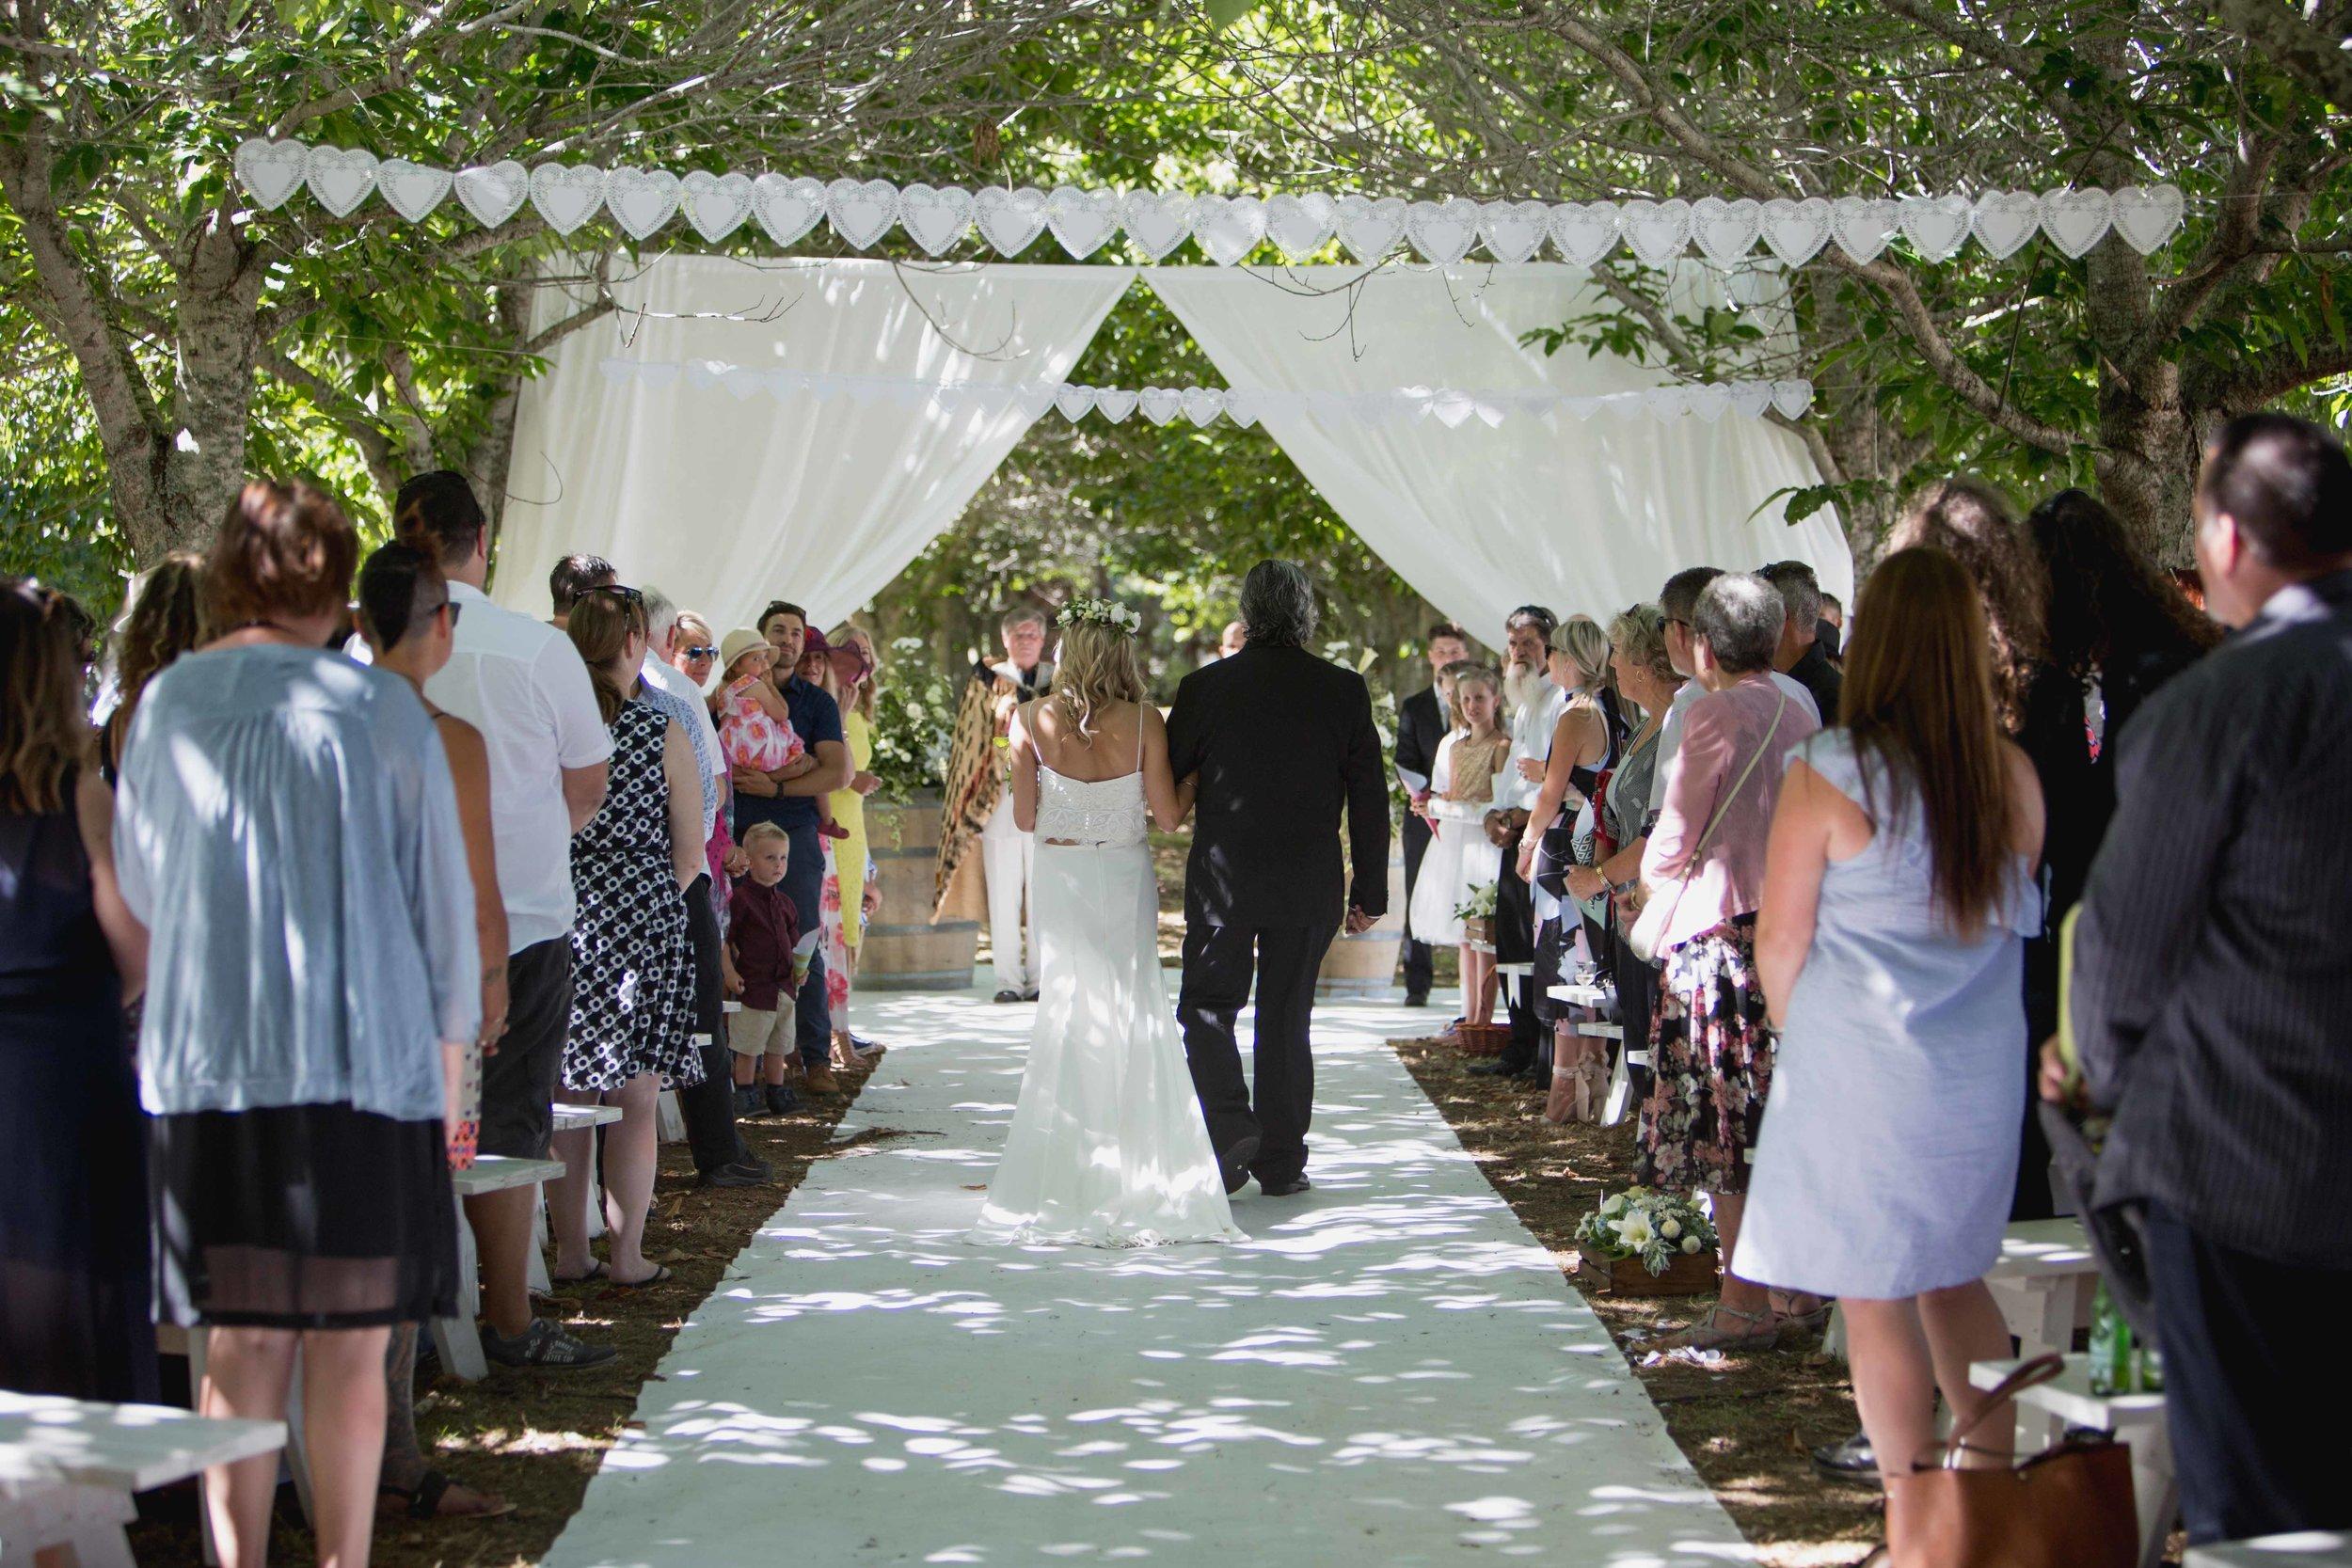 wedding-ceremony-8.jpg